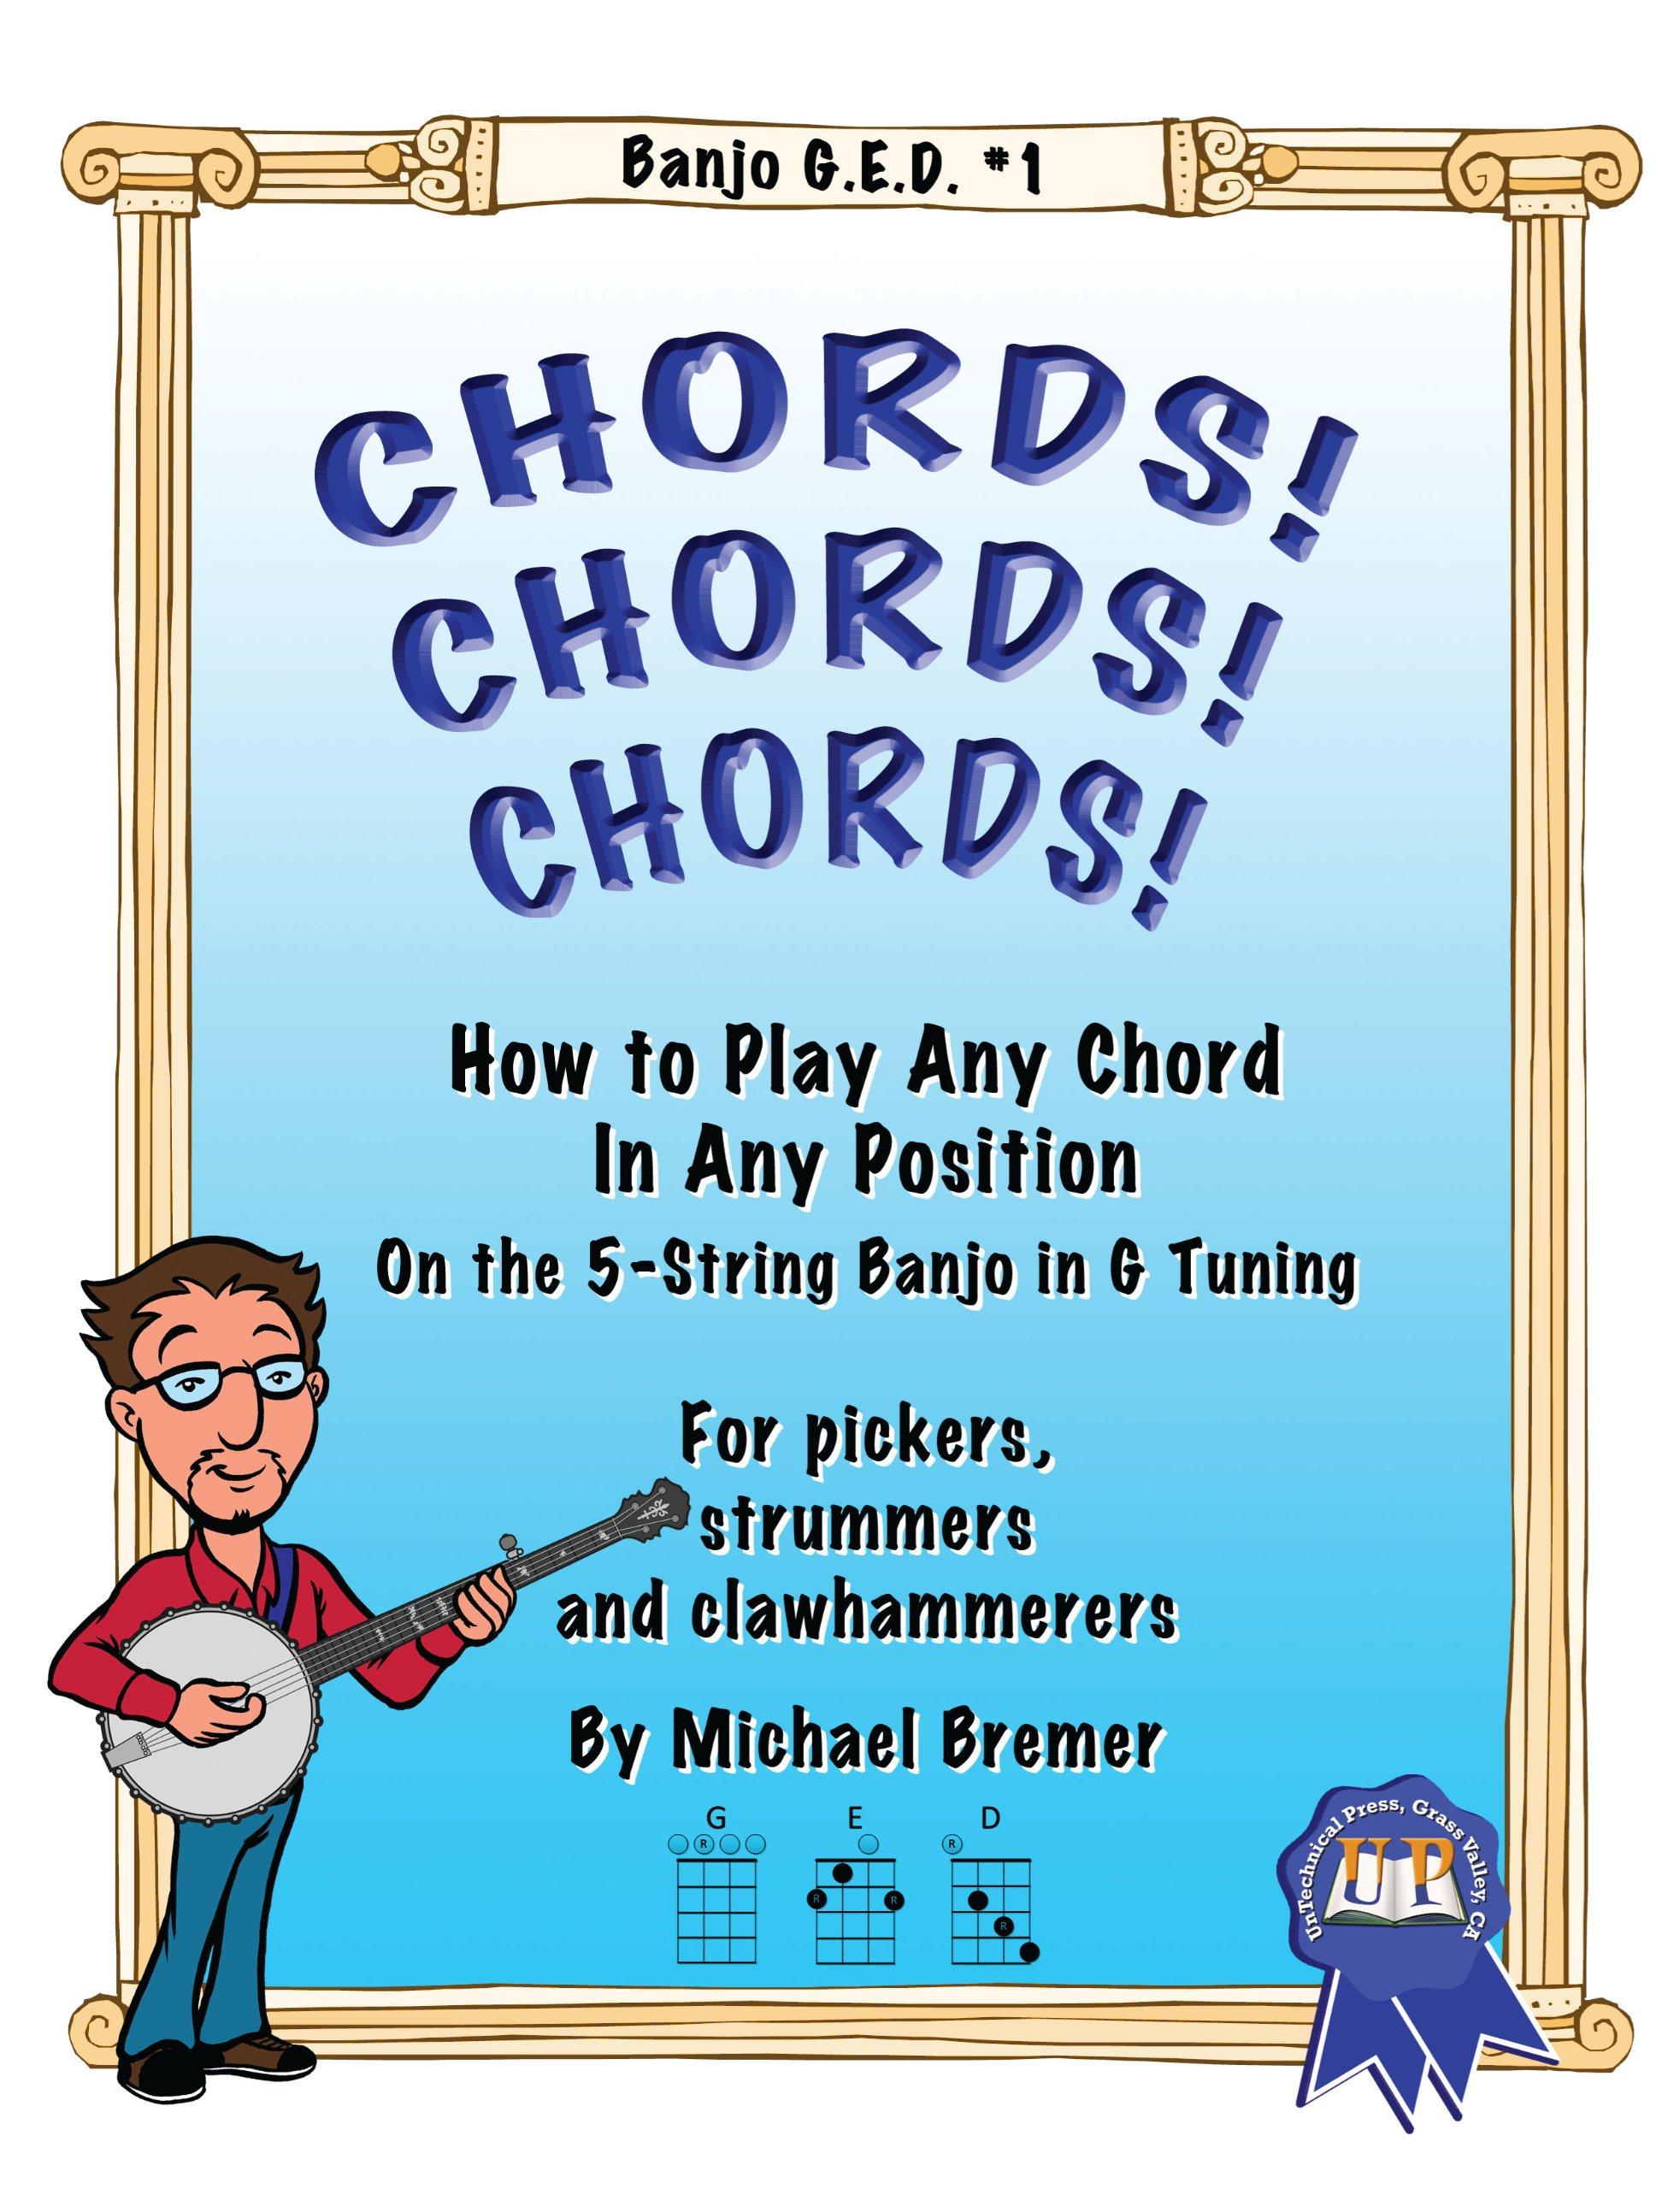 Banjo GED #1: Chords! Chords! Chords! PDF